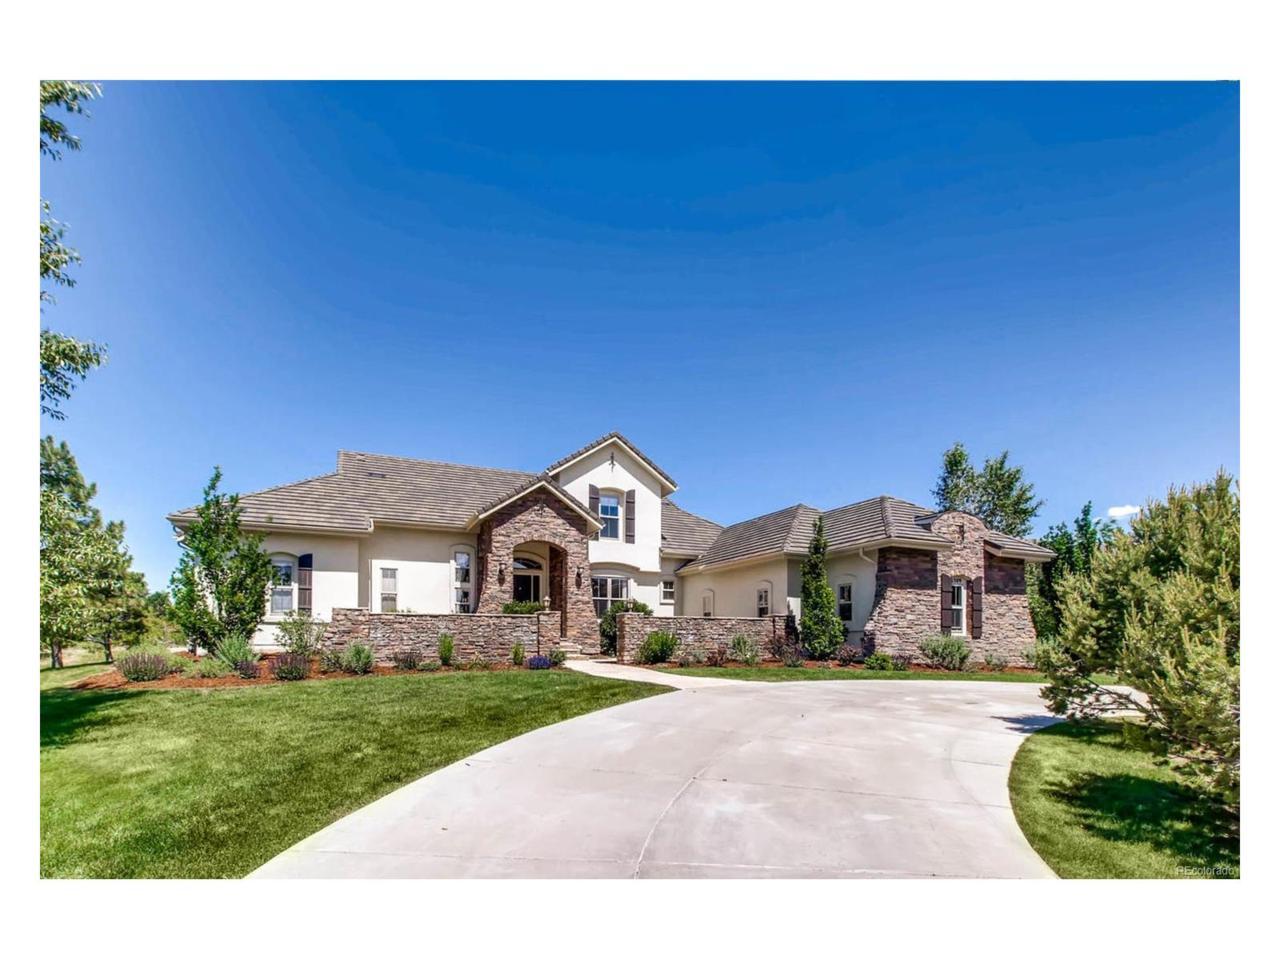 6309 Ellingwood Point Place, Castle Rock, CO 80108 (MLS #2047047) :: 8z Real Estate